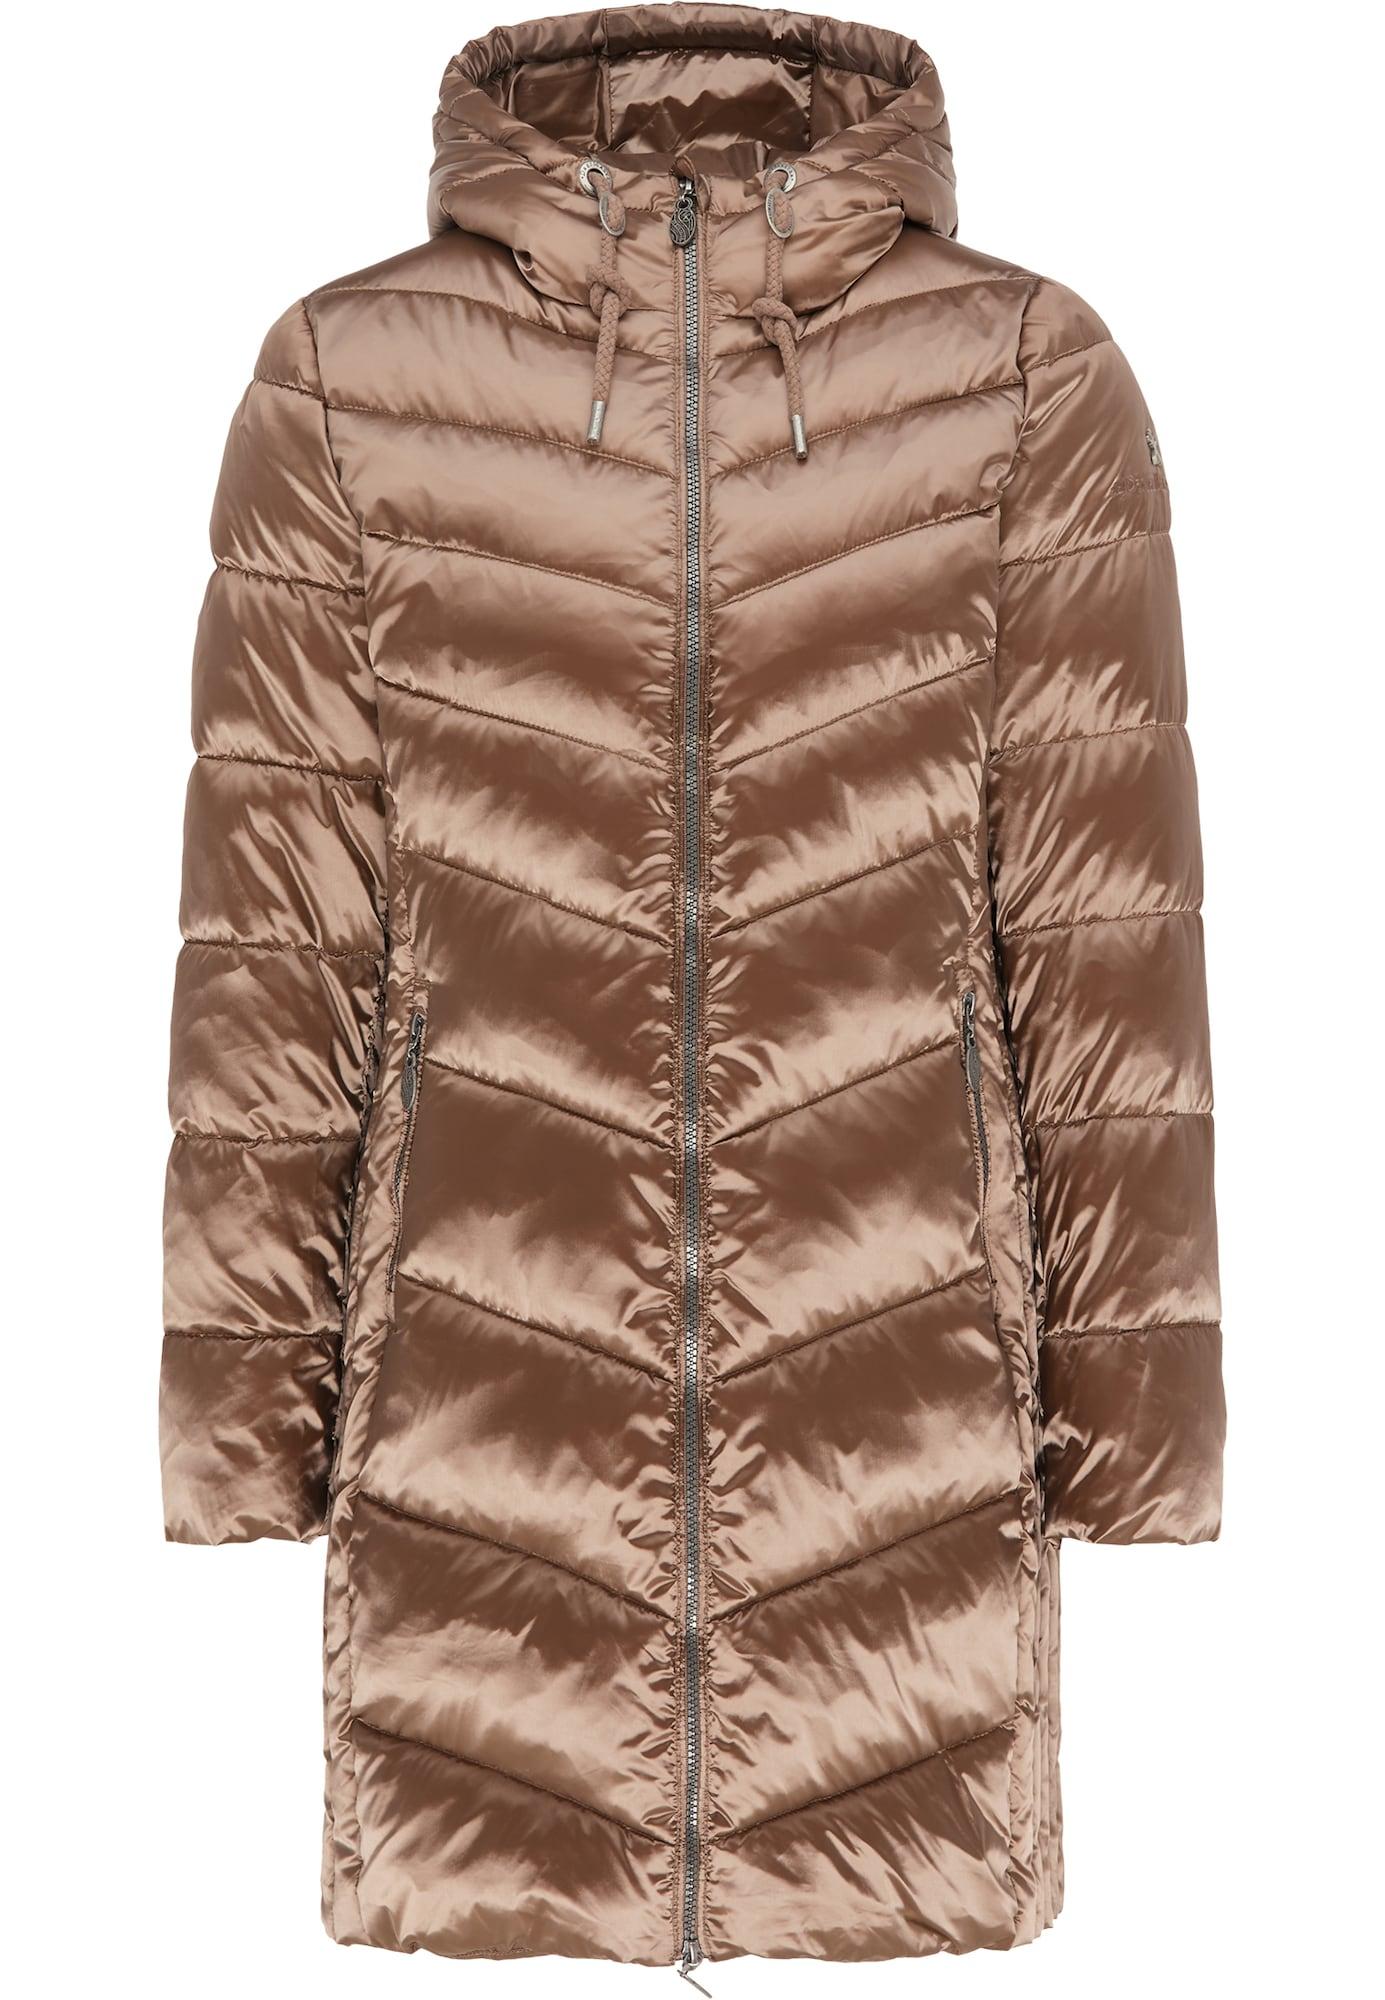 DreiMaster Klassik Žieminis paltas bronzinė